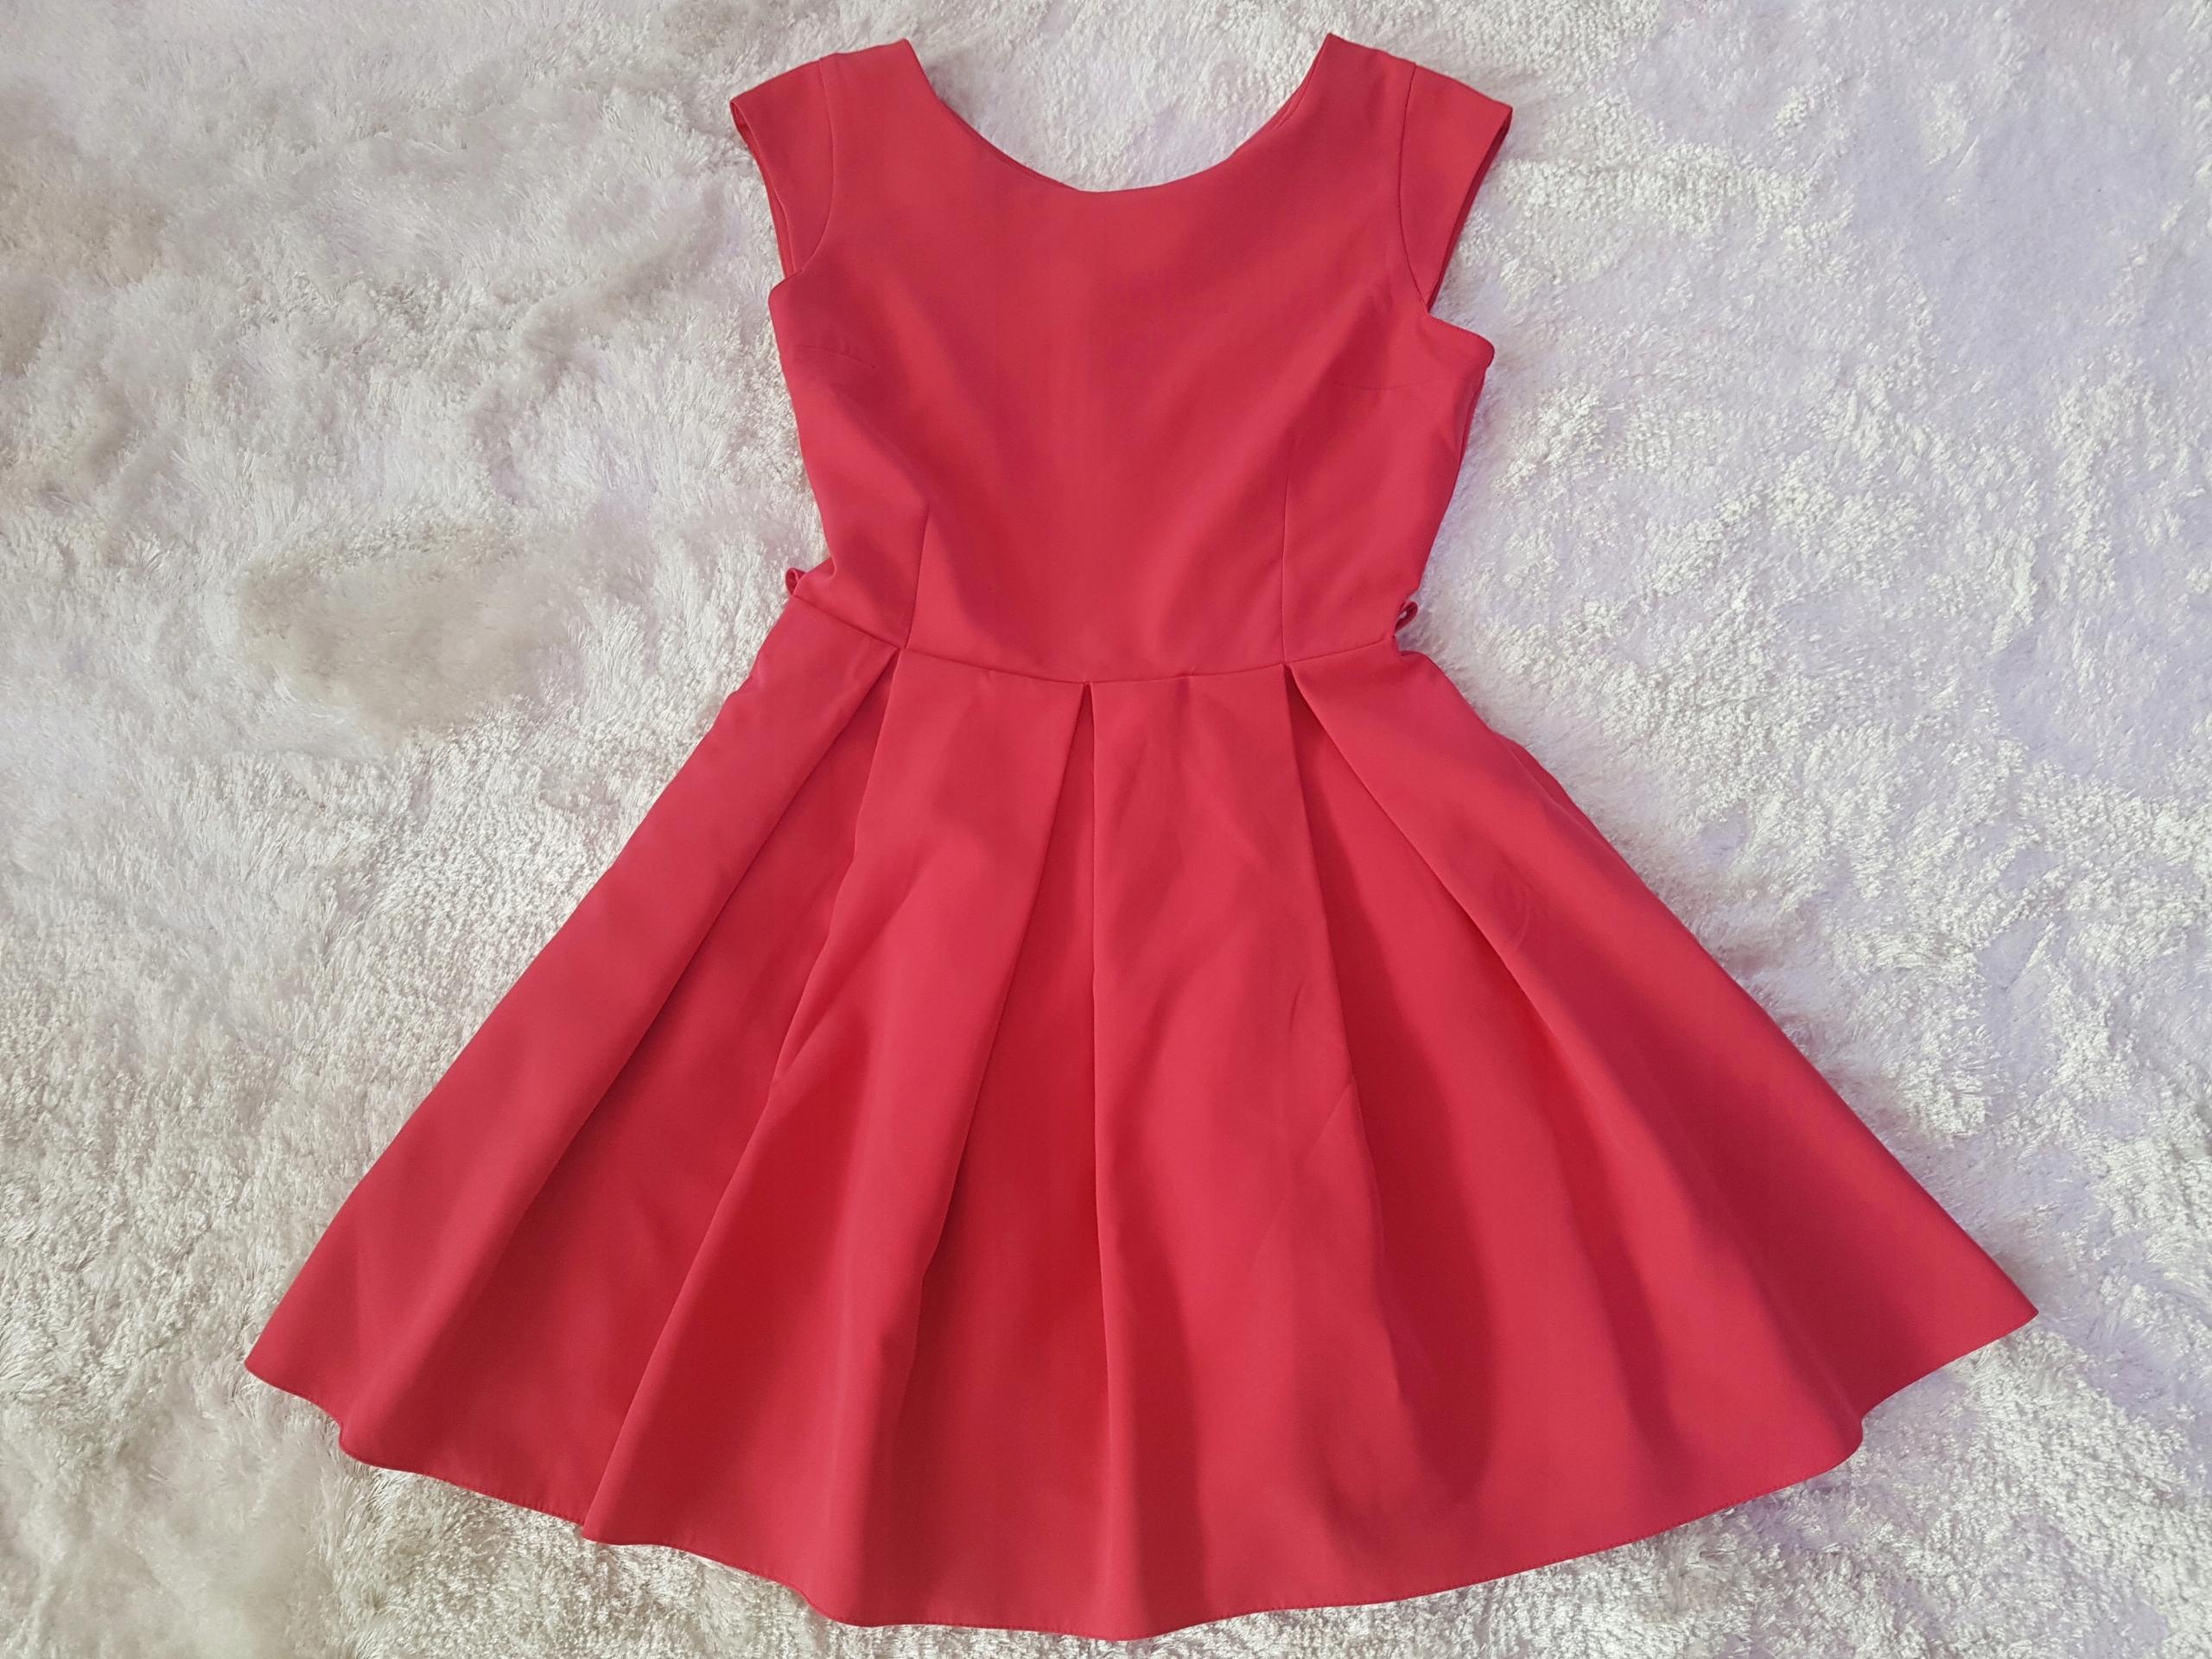 49c4f4d9f5 Sukienka wesele chrzciny malinowa różowa 38 M L 40 - 7498219927 ...